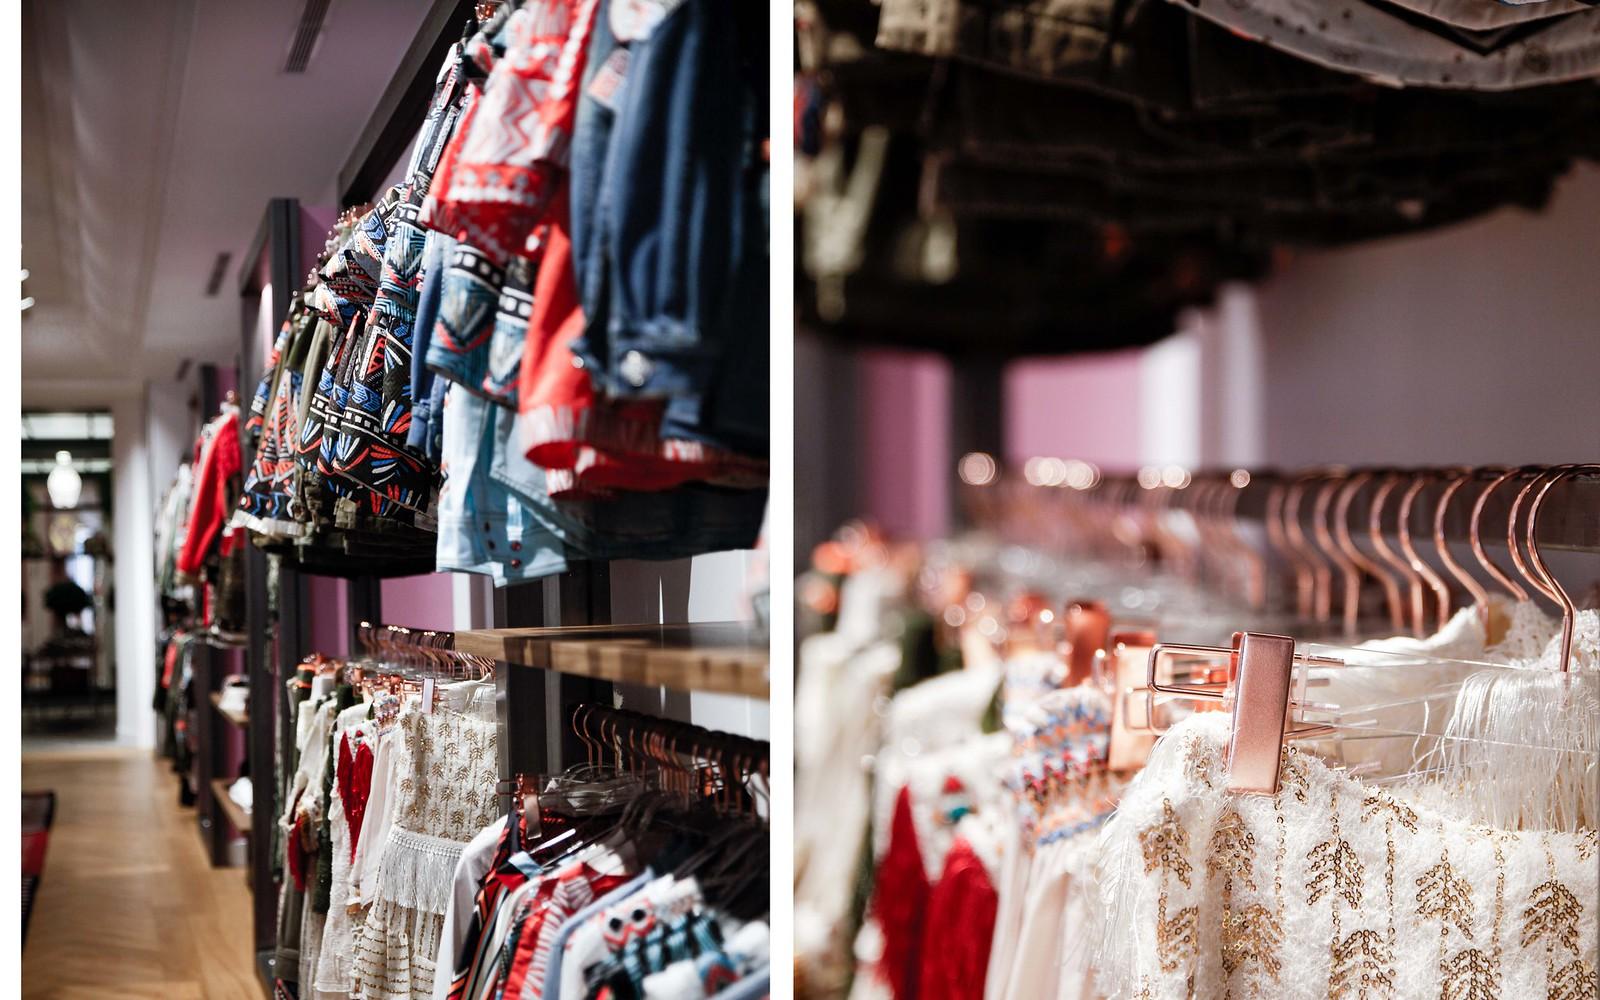 09_Highly_Preppy_abre_su_primera_tienda_en_Bilbao_influencers_fashion_lifestyle_theguestgirl_look_military_khaki_ootd